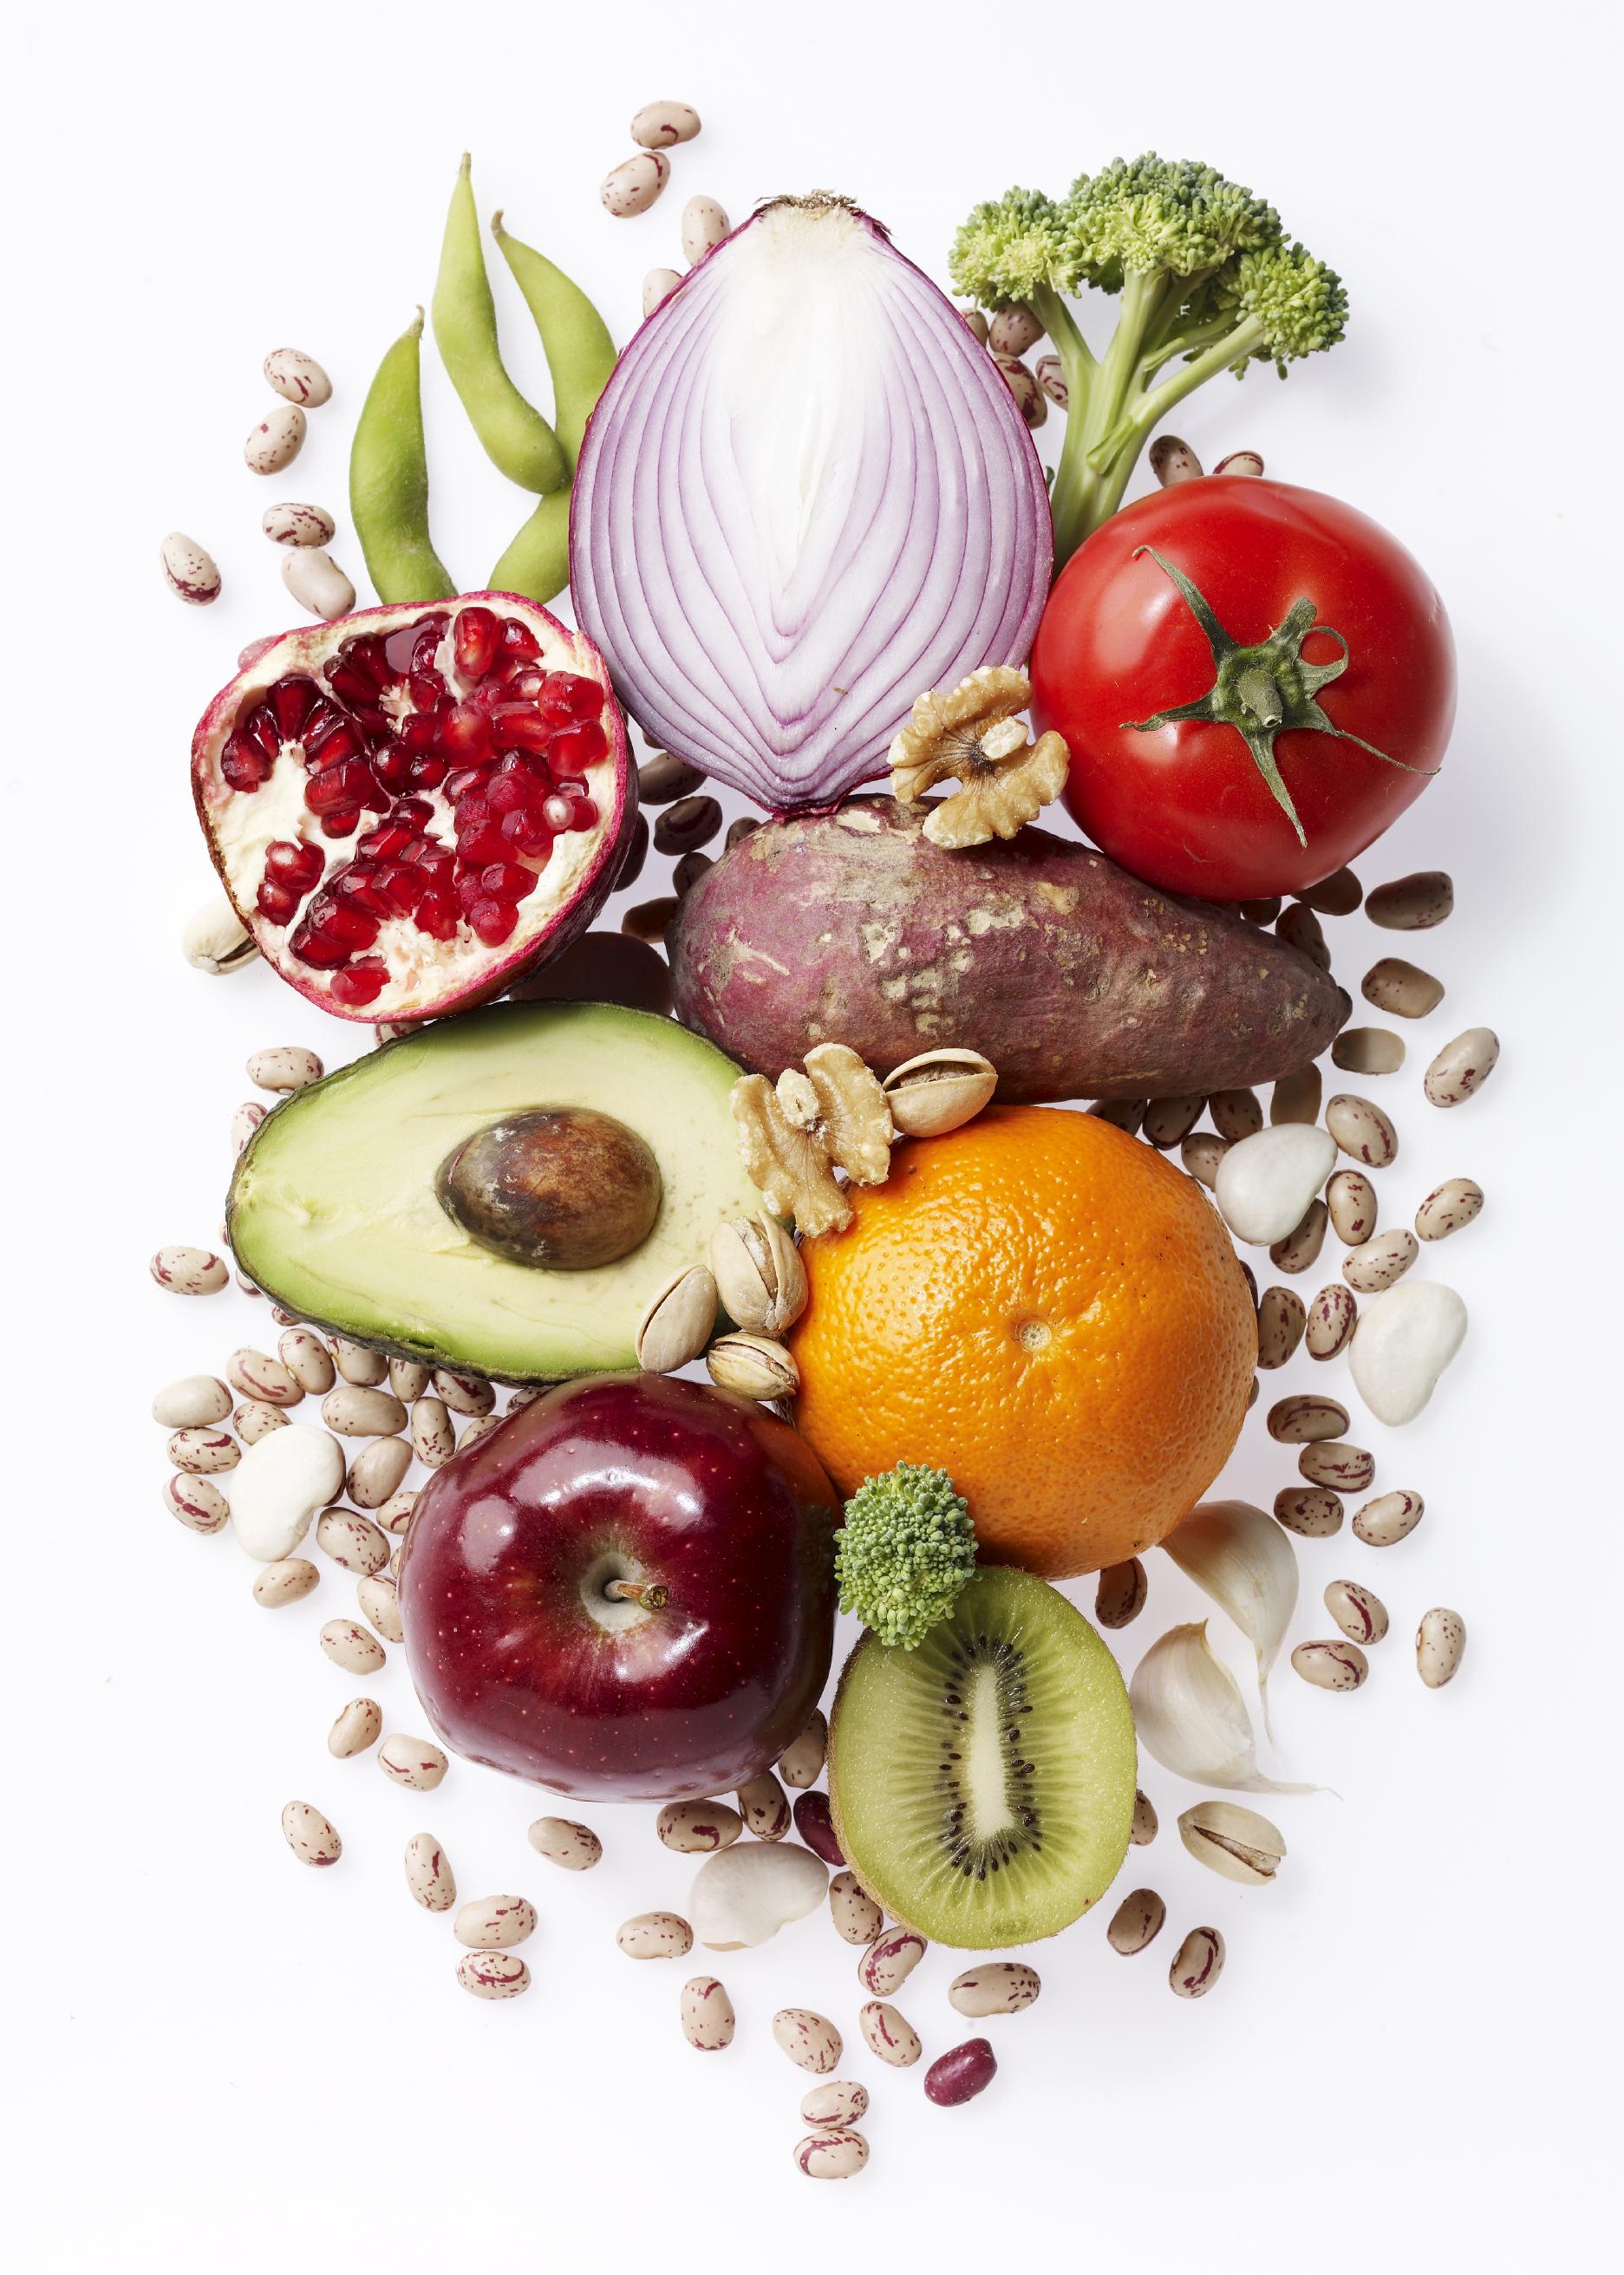 Optimum Nutrition For A Vegan Diet